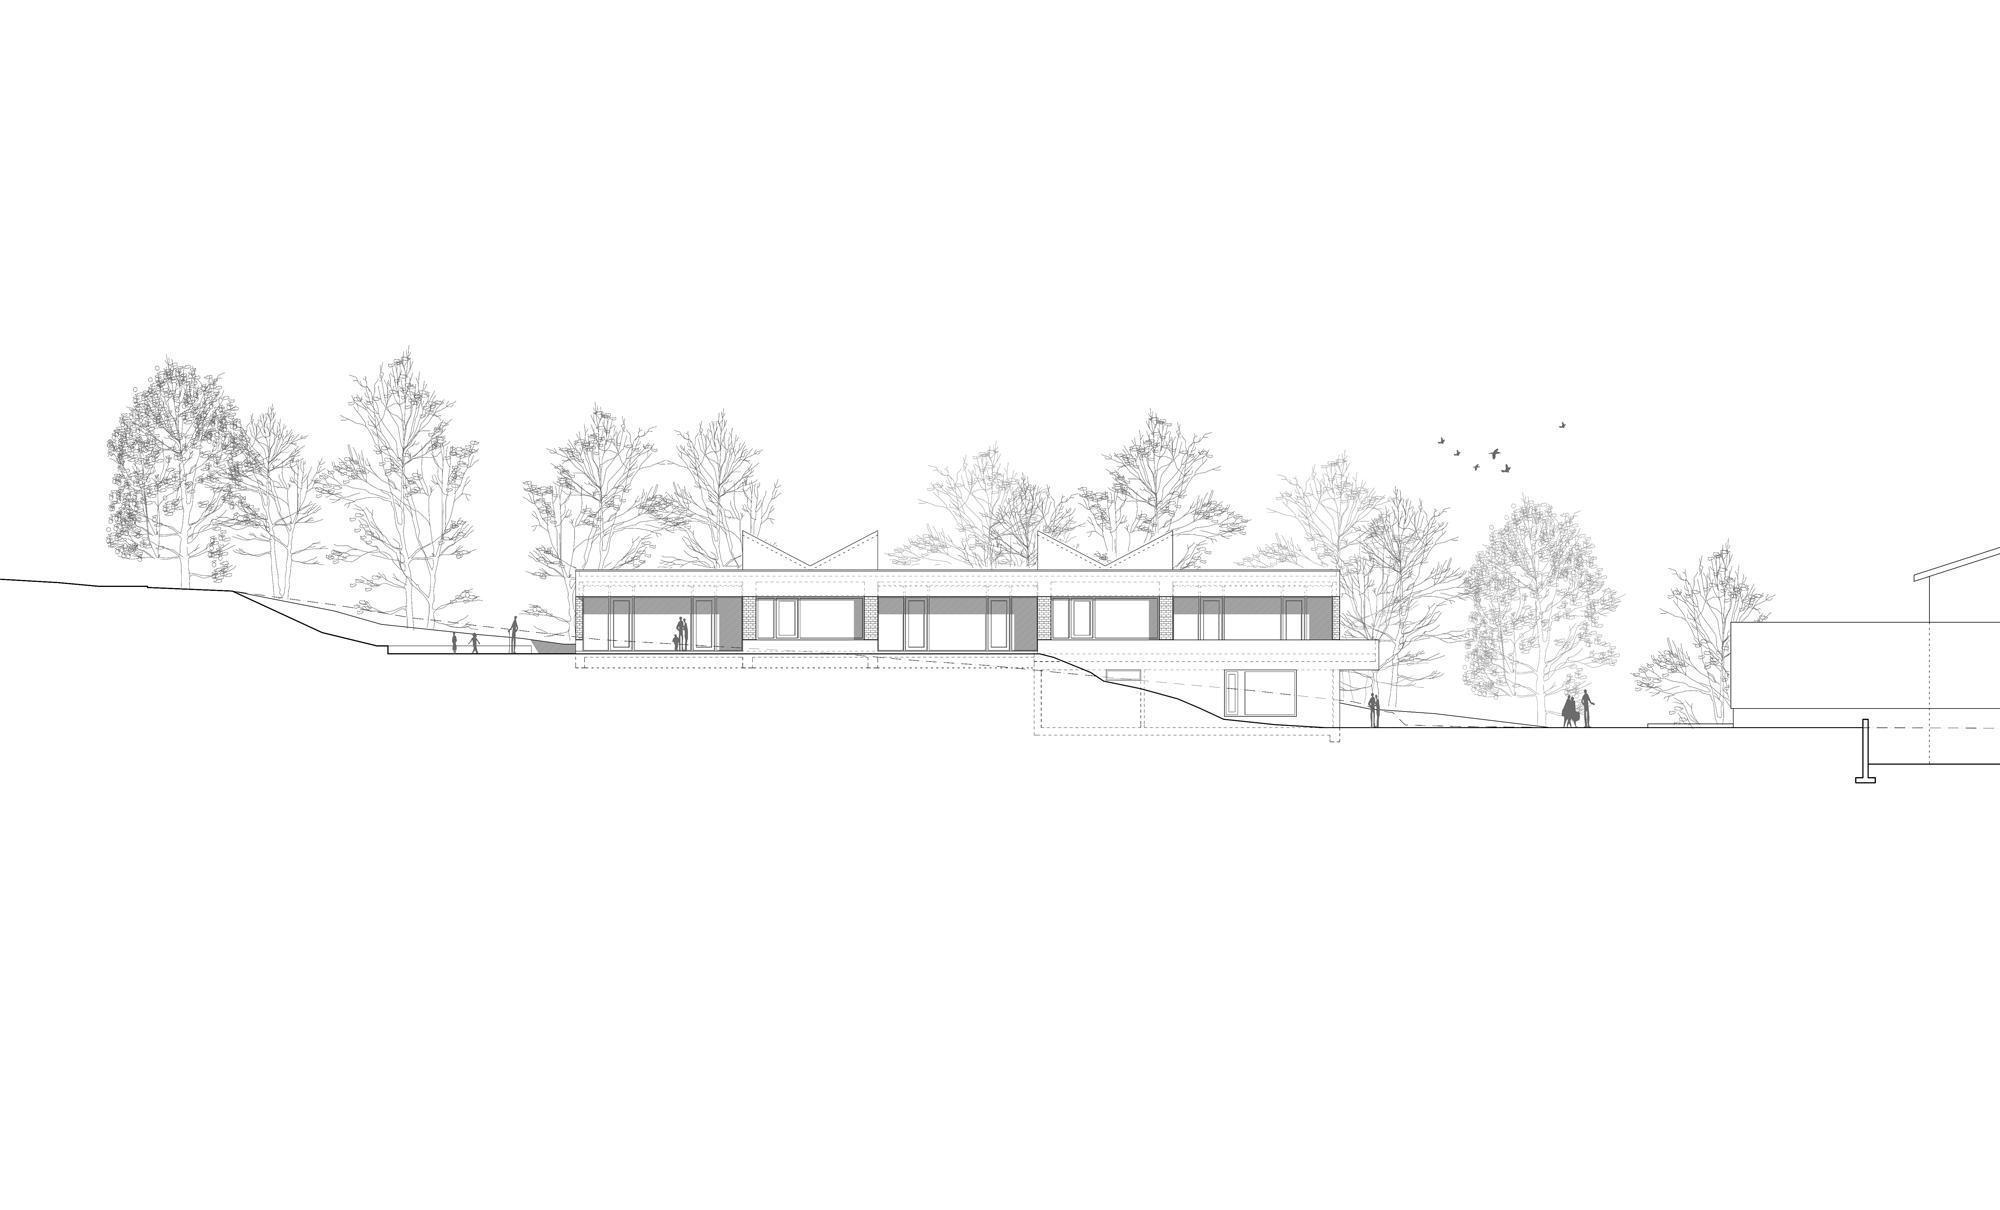 401-Süd--Ostfassade-Neubau-Kiga-Neuenkirch-1_200_web.png